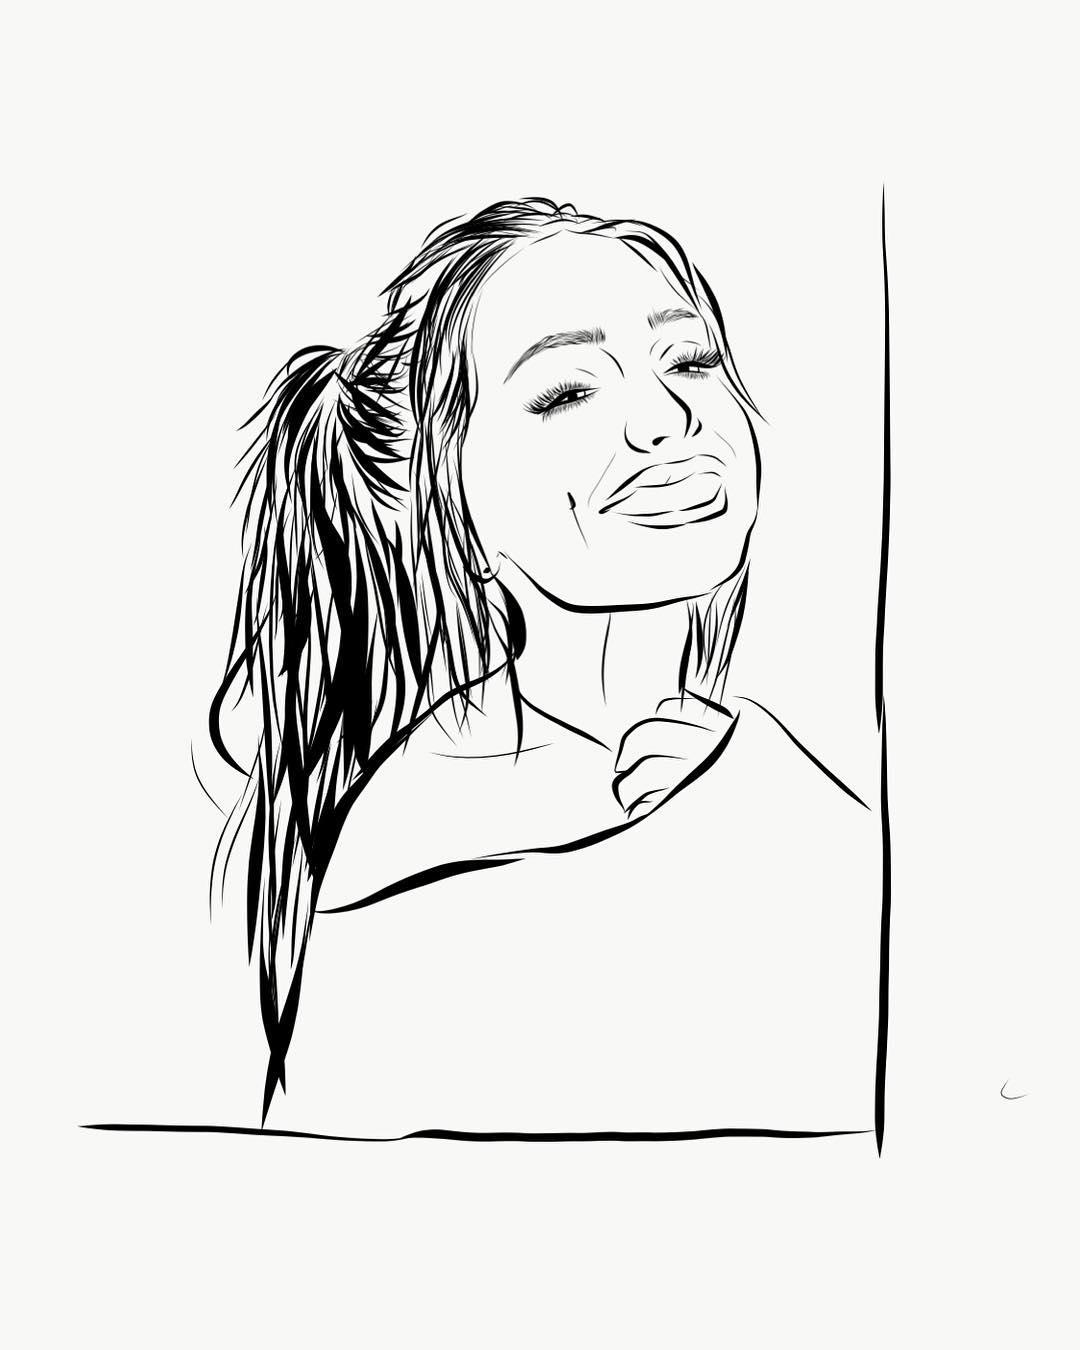 1080x1350 Ariana Grande Drawing On Instagram